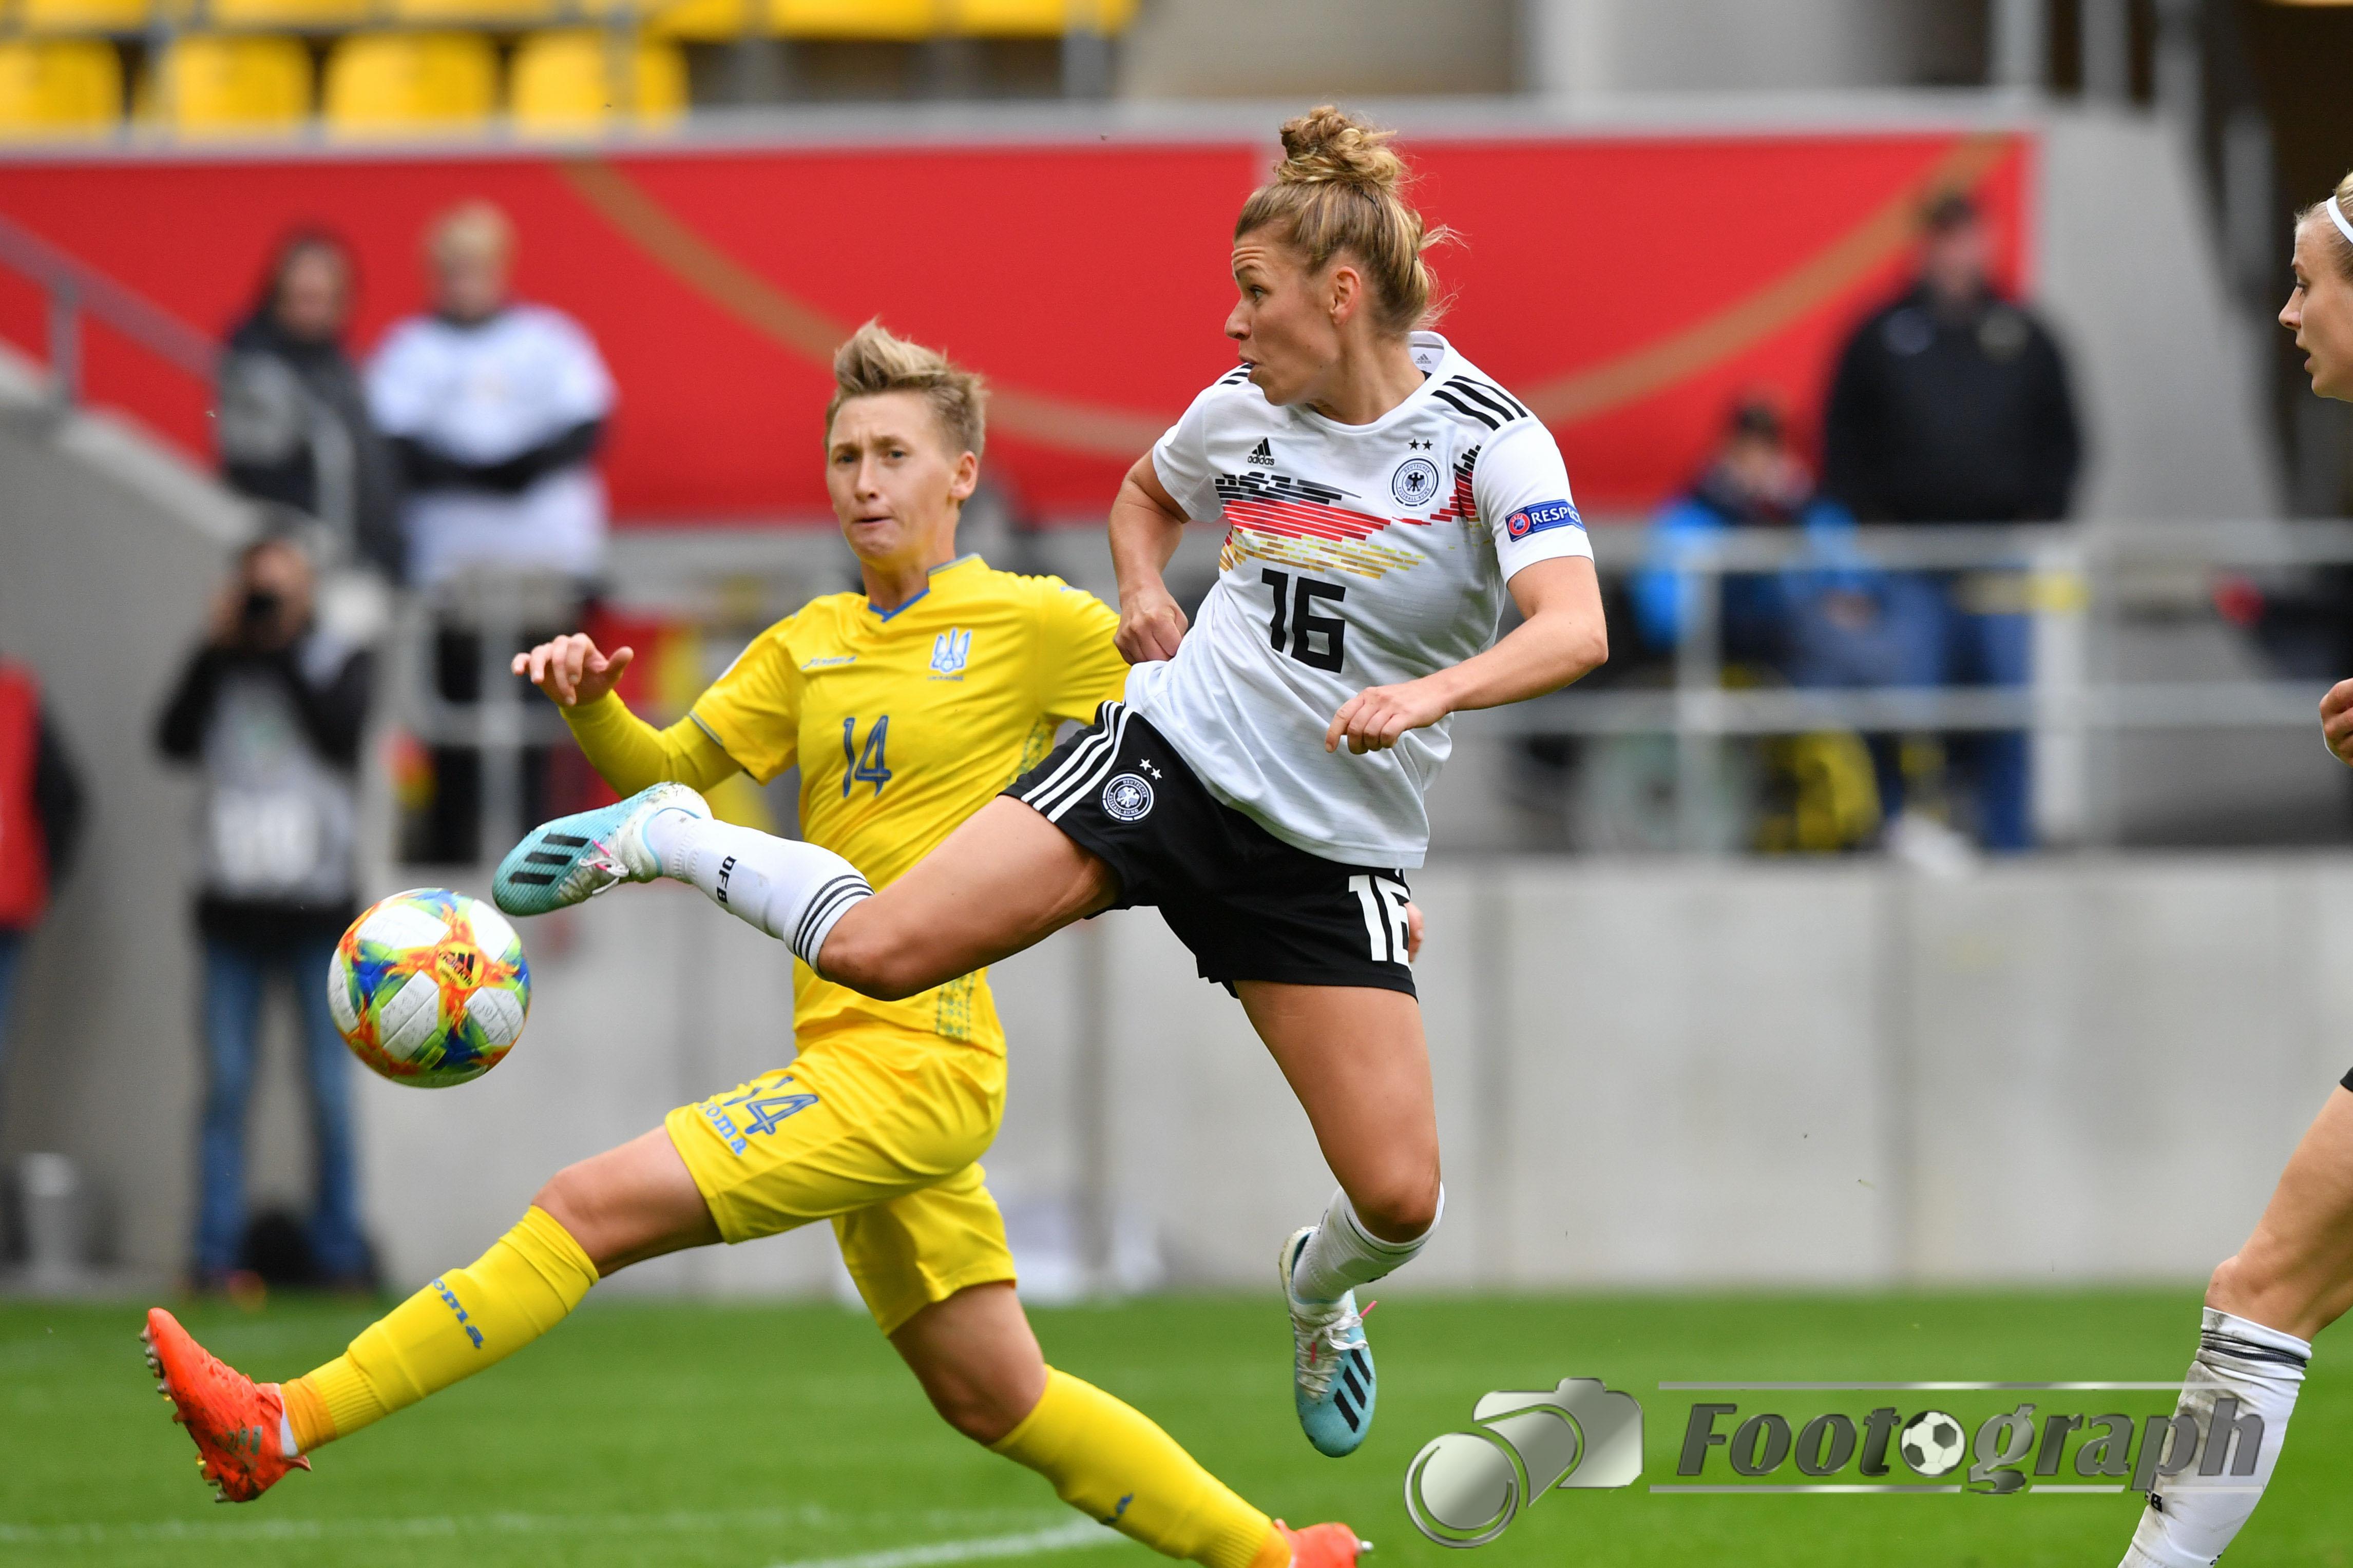 FrauenfuГџball Wm 2021 Qualifikation